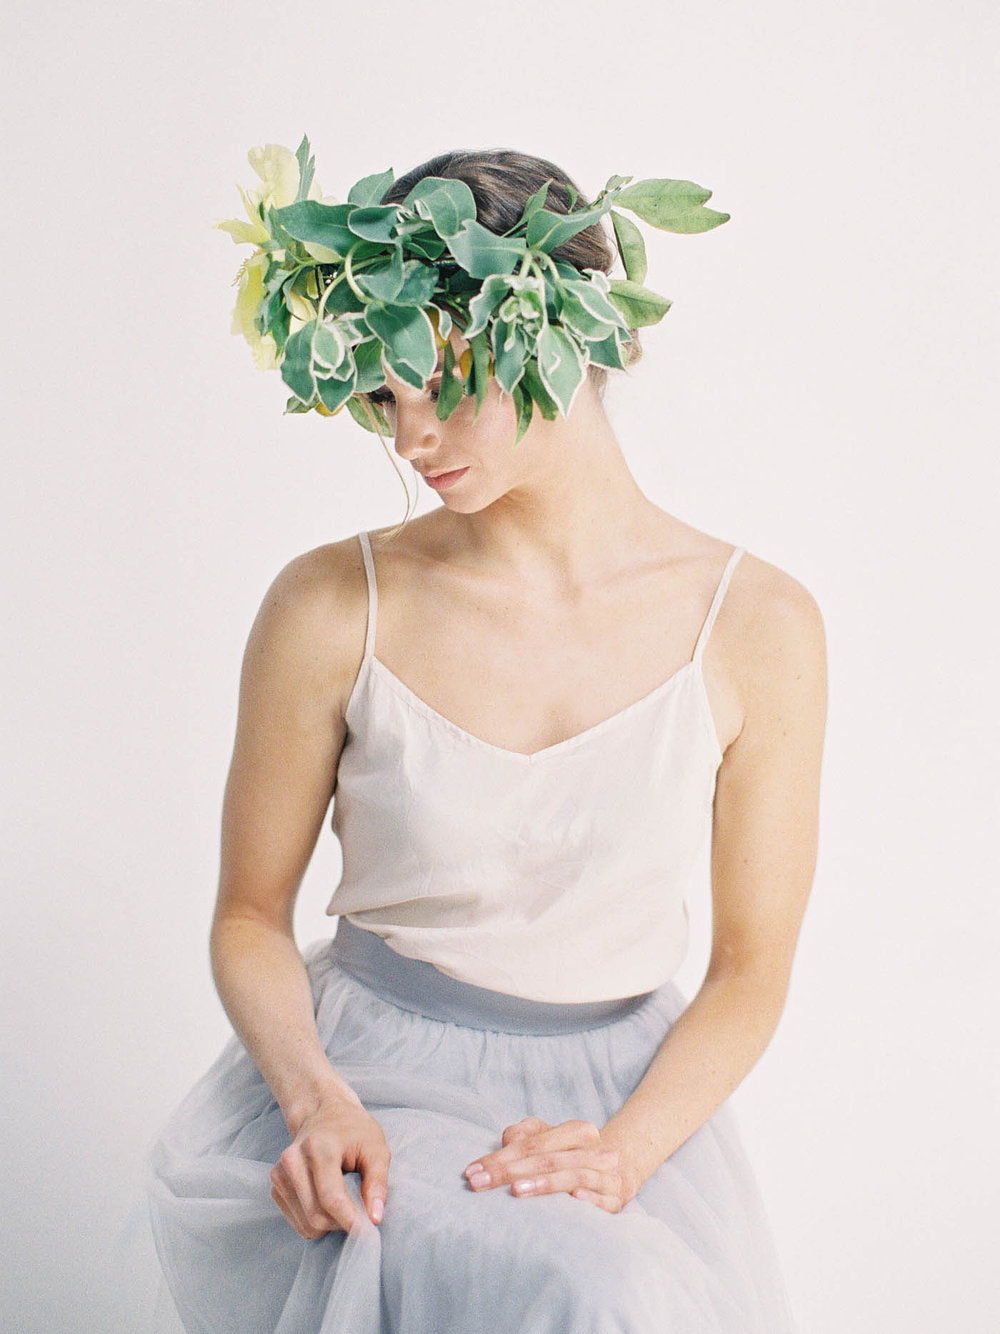 floral-crown-1-Jen_Huang-006837-R1-E015.jpg